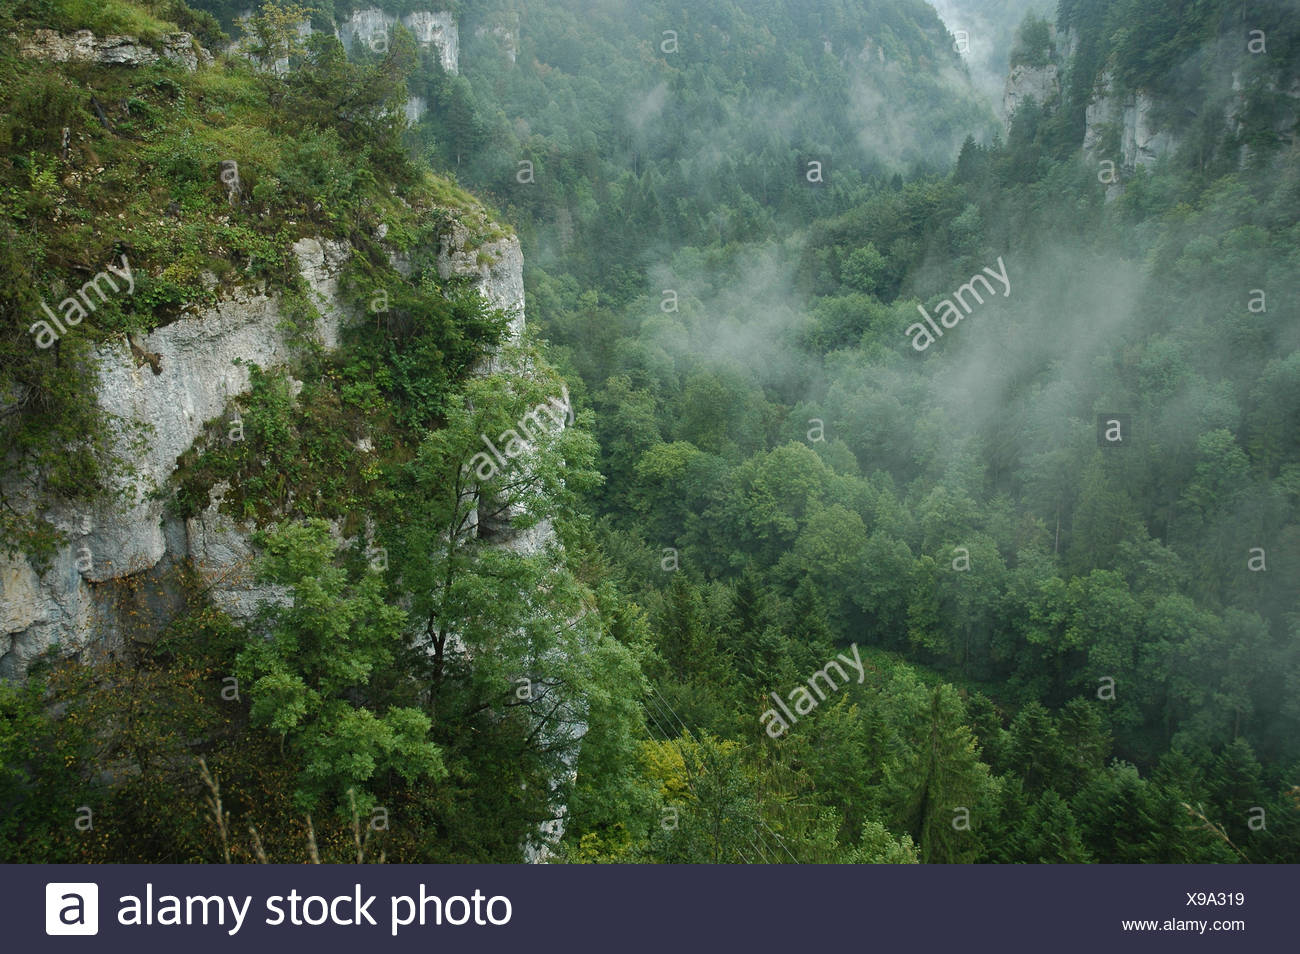 Switzerland, Europe, France, Doubs, border, country border, Clos du Doubs, Echelles de la Mort, rock, cliff, gulch, wood, forest, - Stock Image